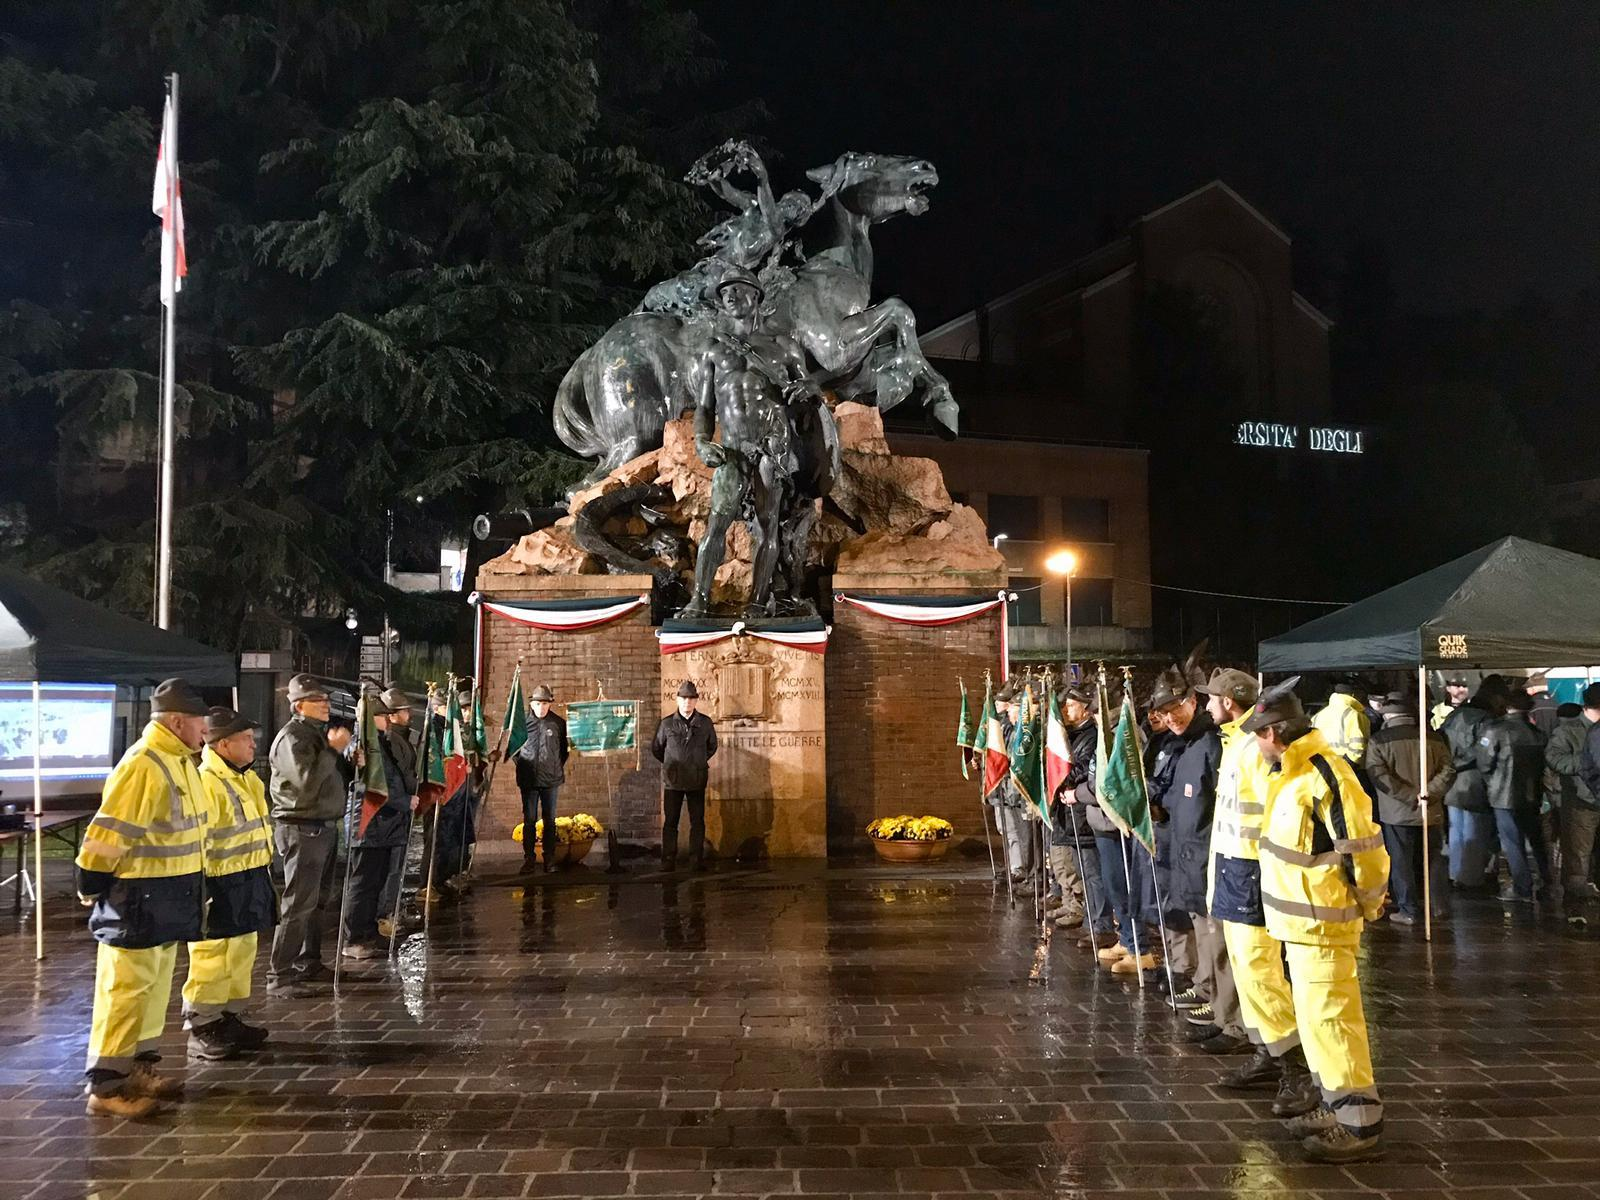 Presidio-Monumento-Caduti-3_4-11-19_16